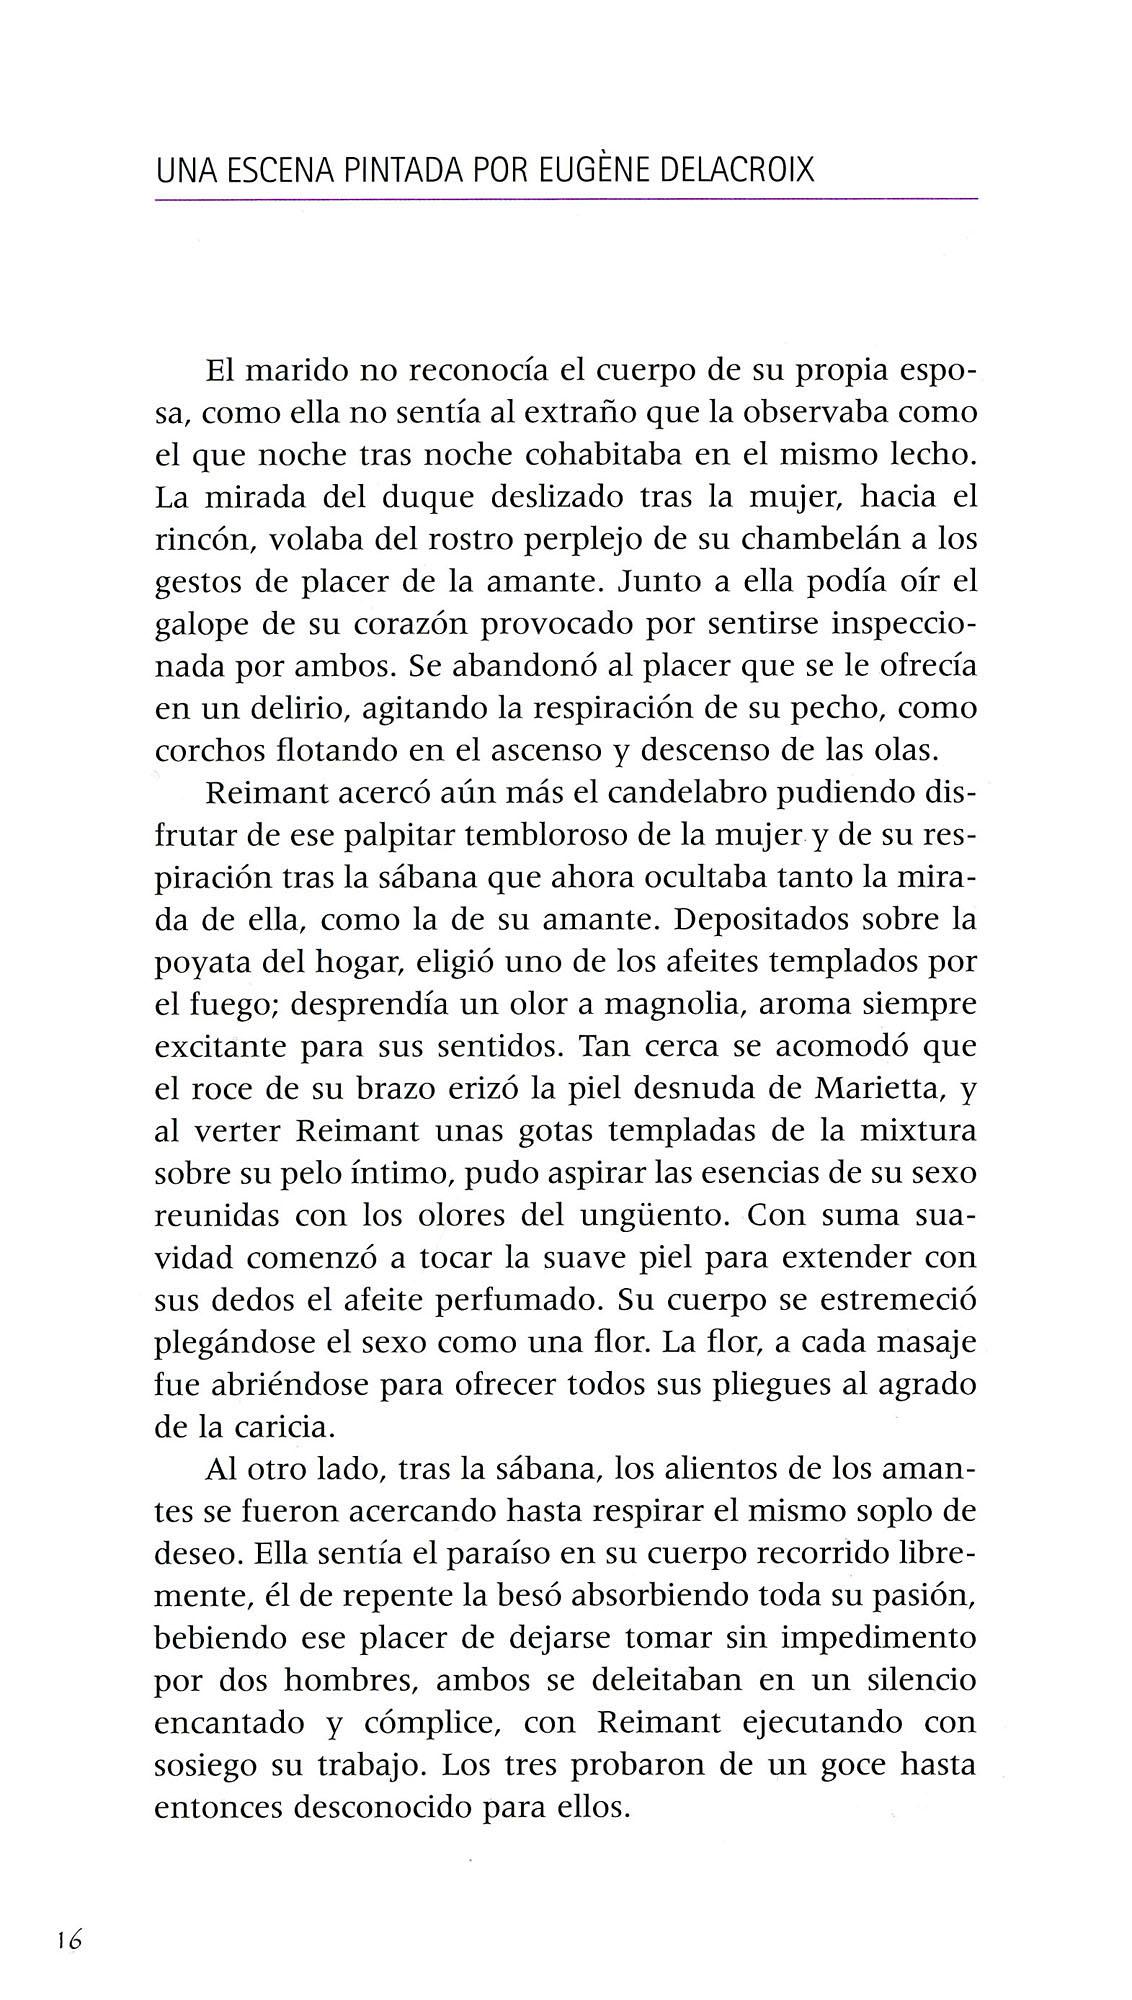 danielvillalobos-calderonsamaniego-story-storyerotic-spanishliterature-10